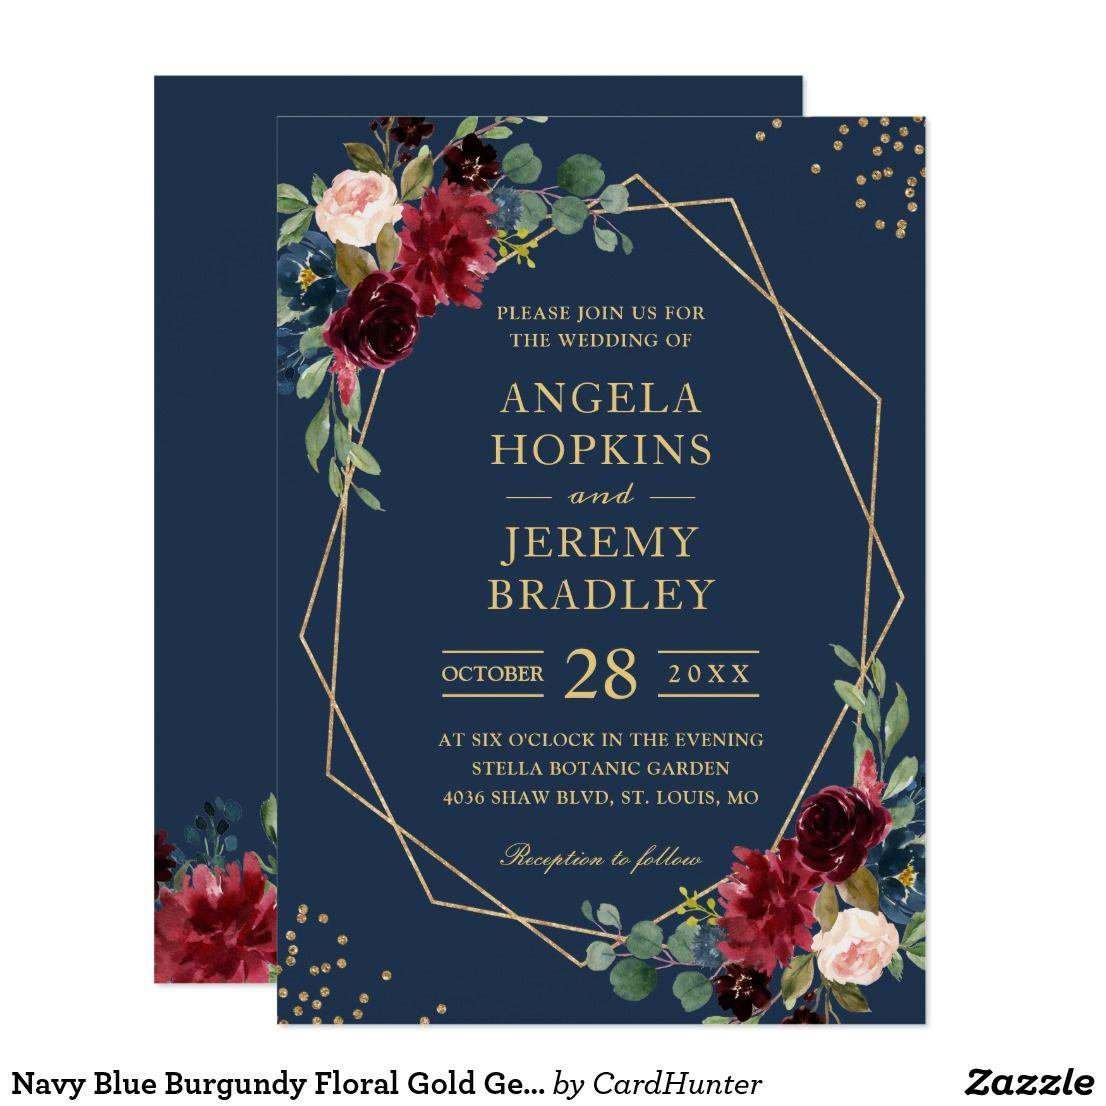 Burgundy Merlot Roses Sunflowers Sunflower Marsala Floral Wedding Suite Maroon Blush Pink Red Floral Gold Geometric Invite Set